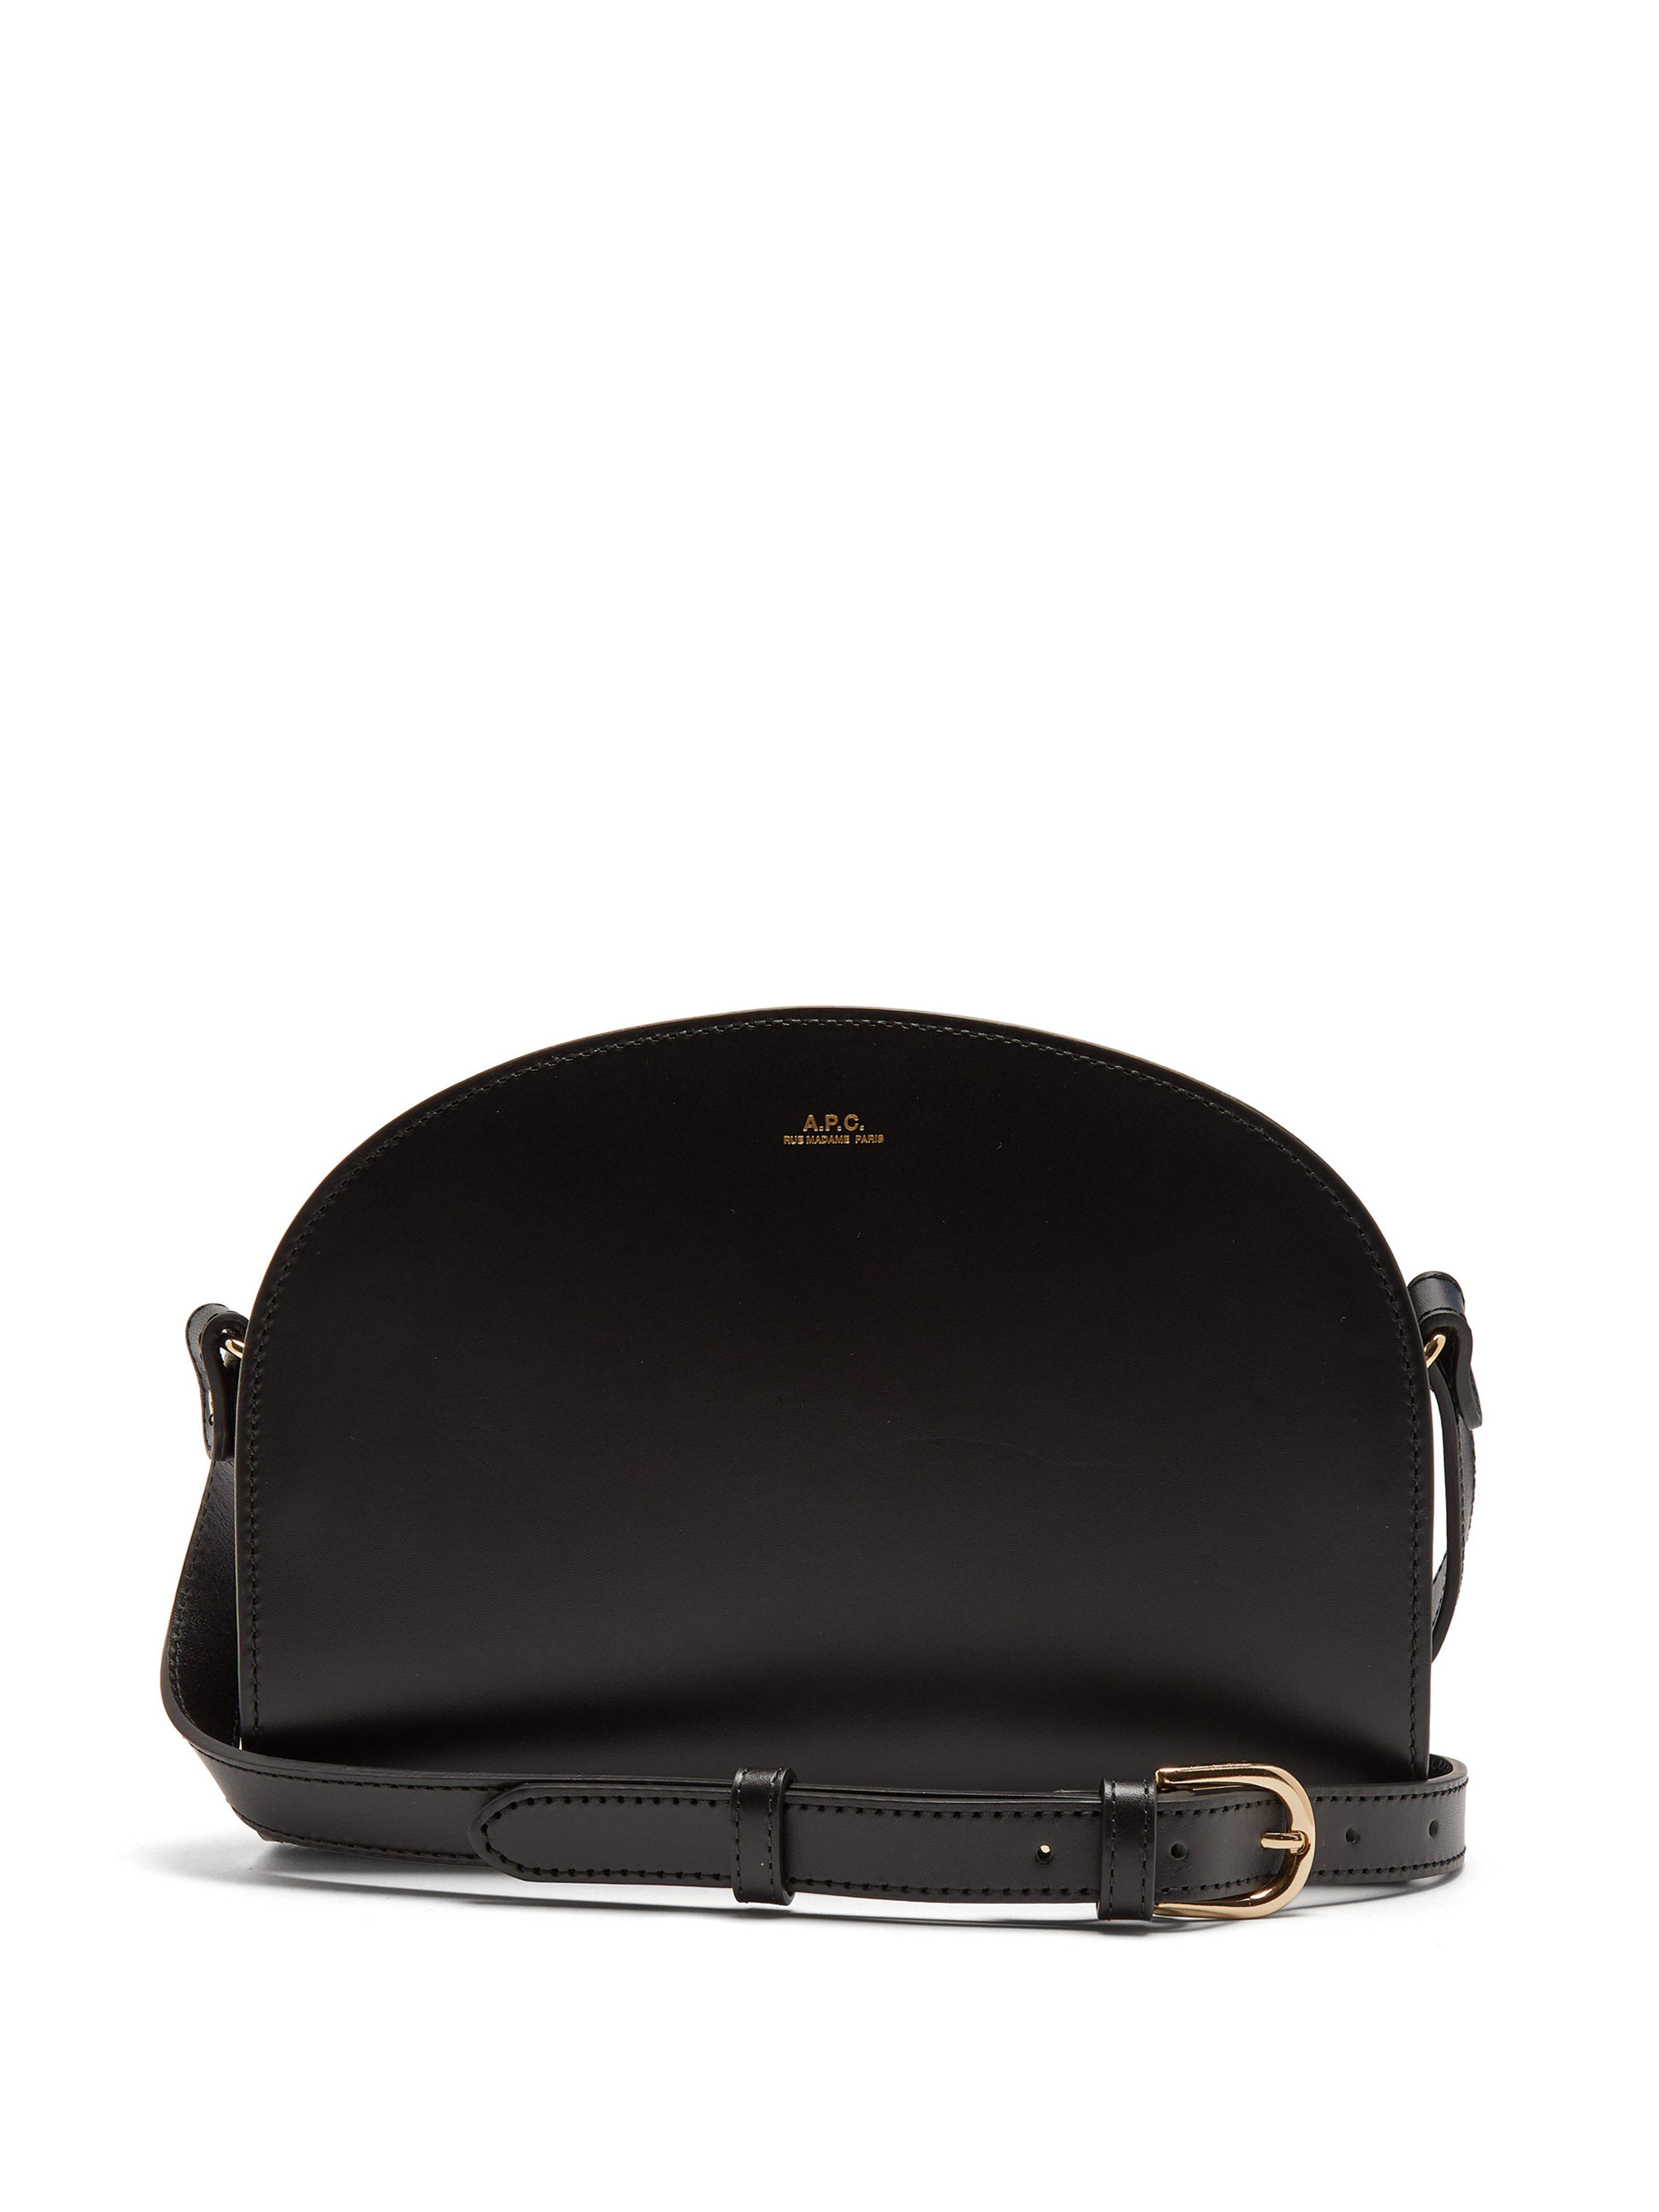 15b800cc1b Women's Black Half Moon Leather Cross Body Bag | shoulder bags ...